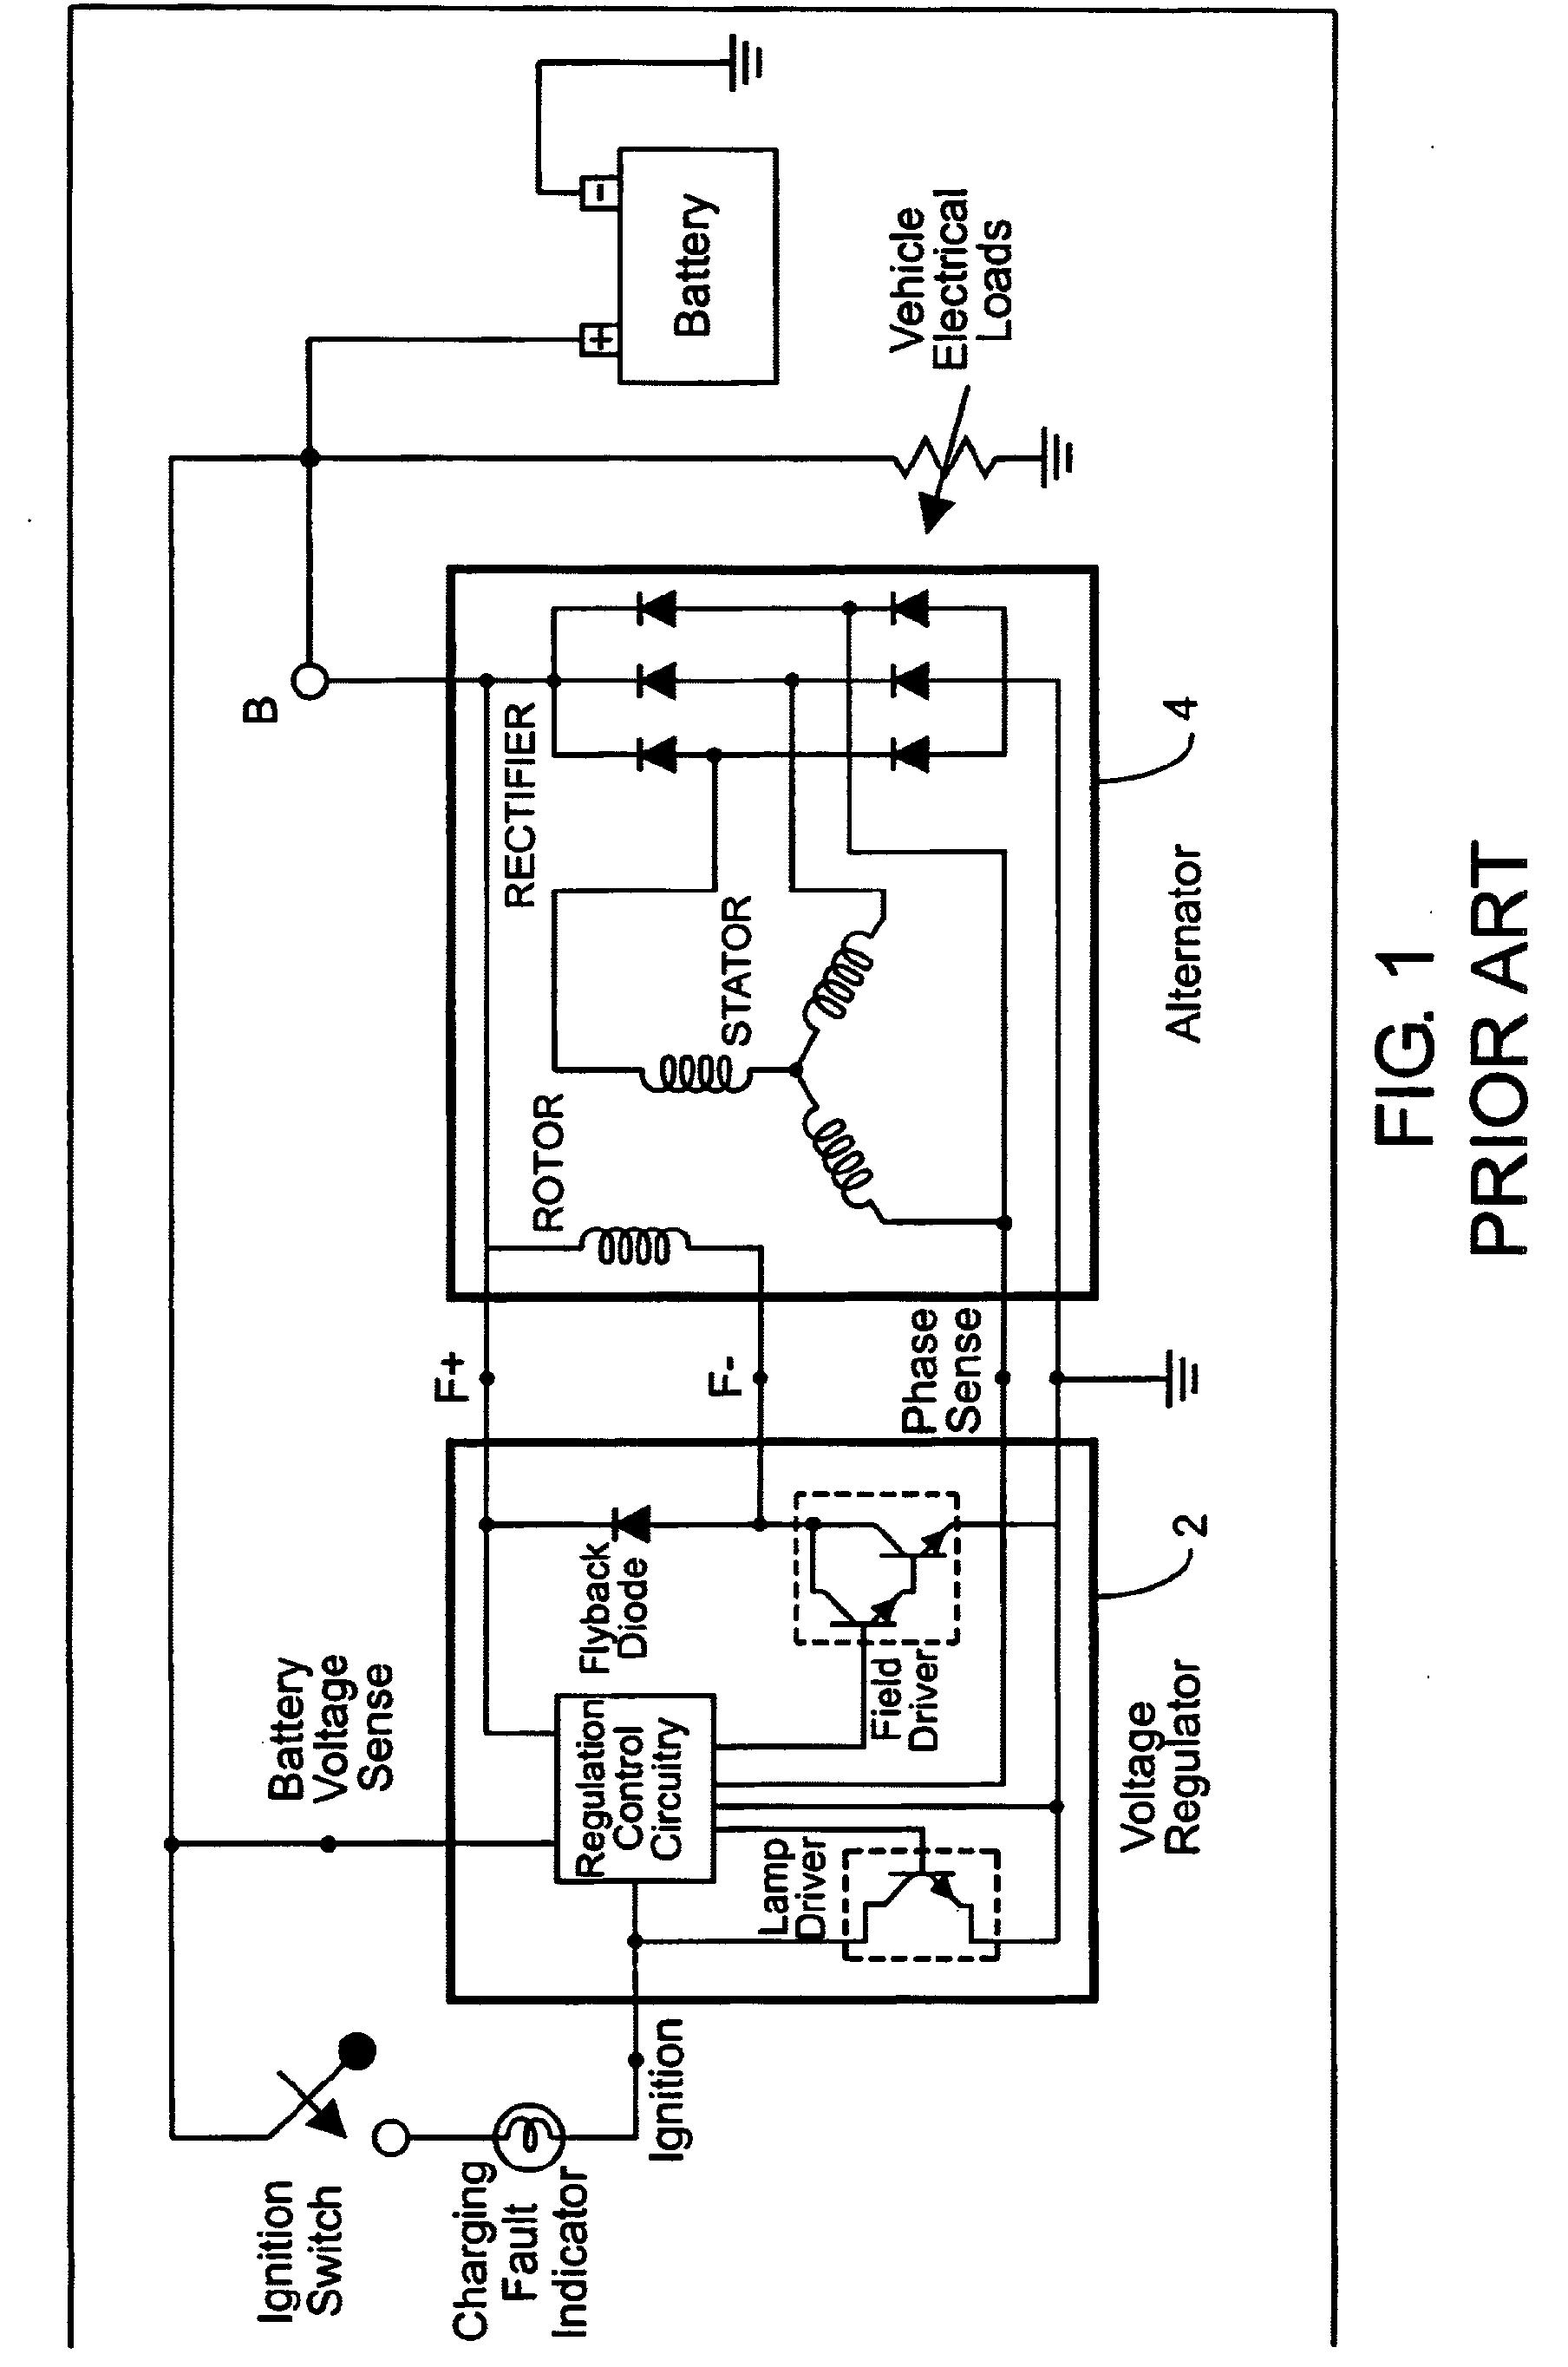 patent ep1401081a2 intelligent automotive voltage regulation patent drawing